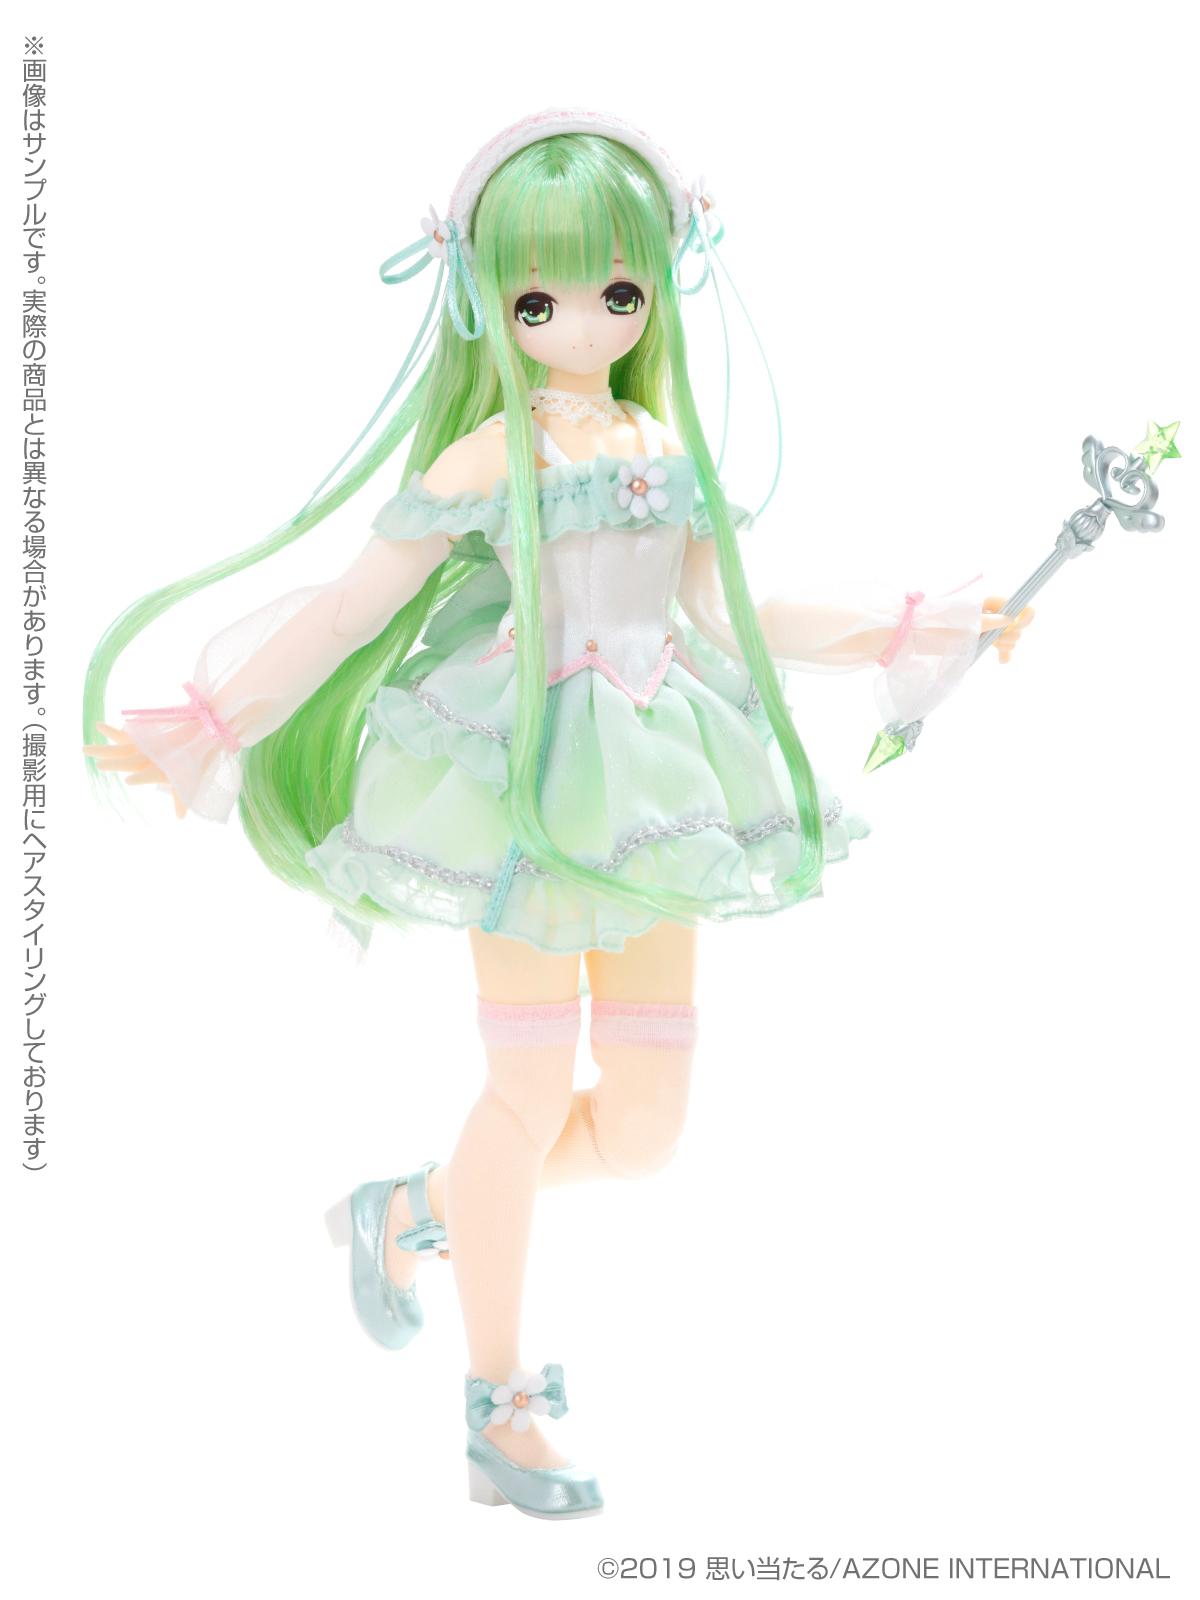 Magical☆CUTE『Floral Ease Miu(みう)』えっくす☆きゅーと 1/6 完成品ドール-002